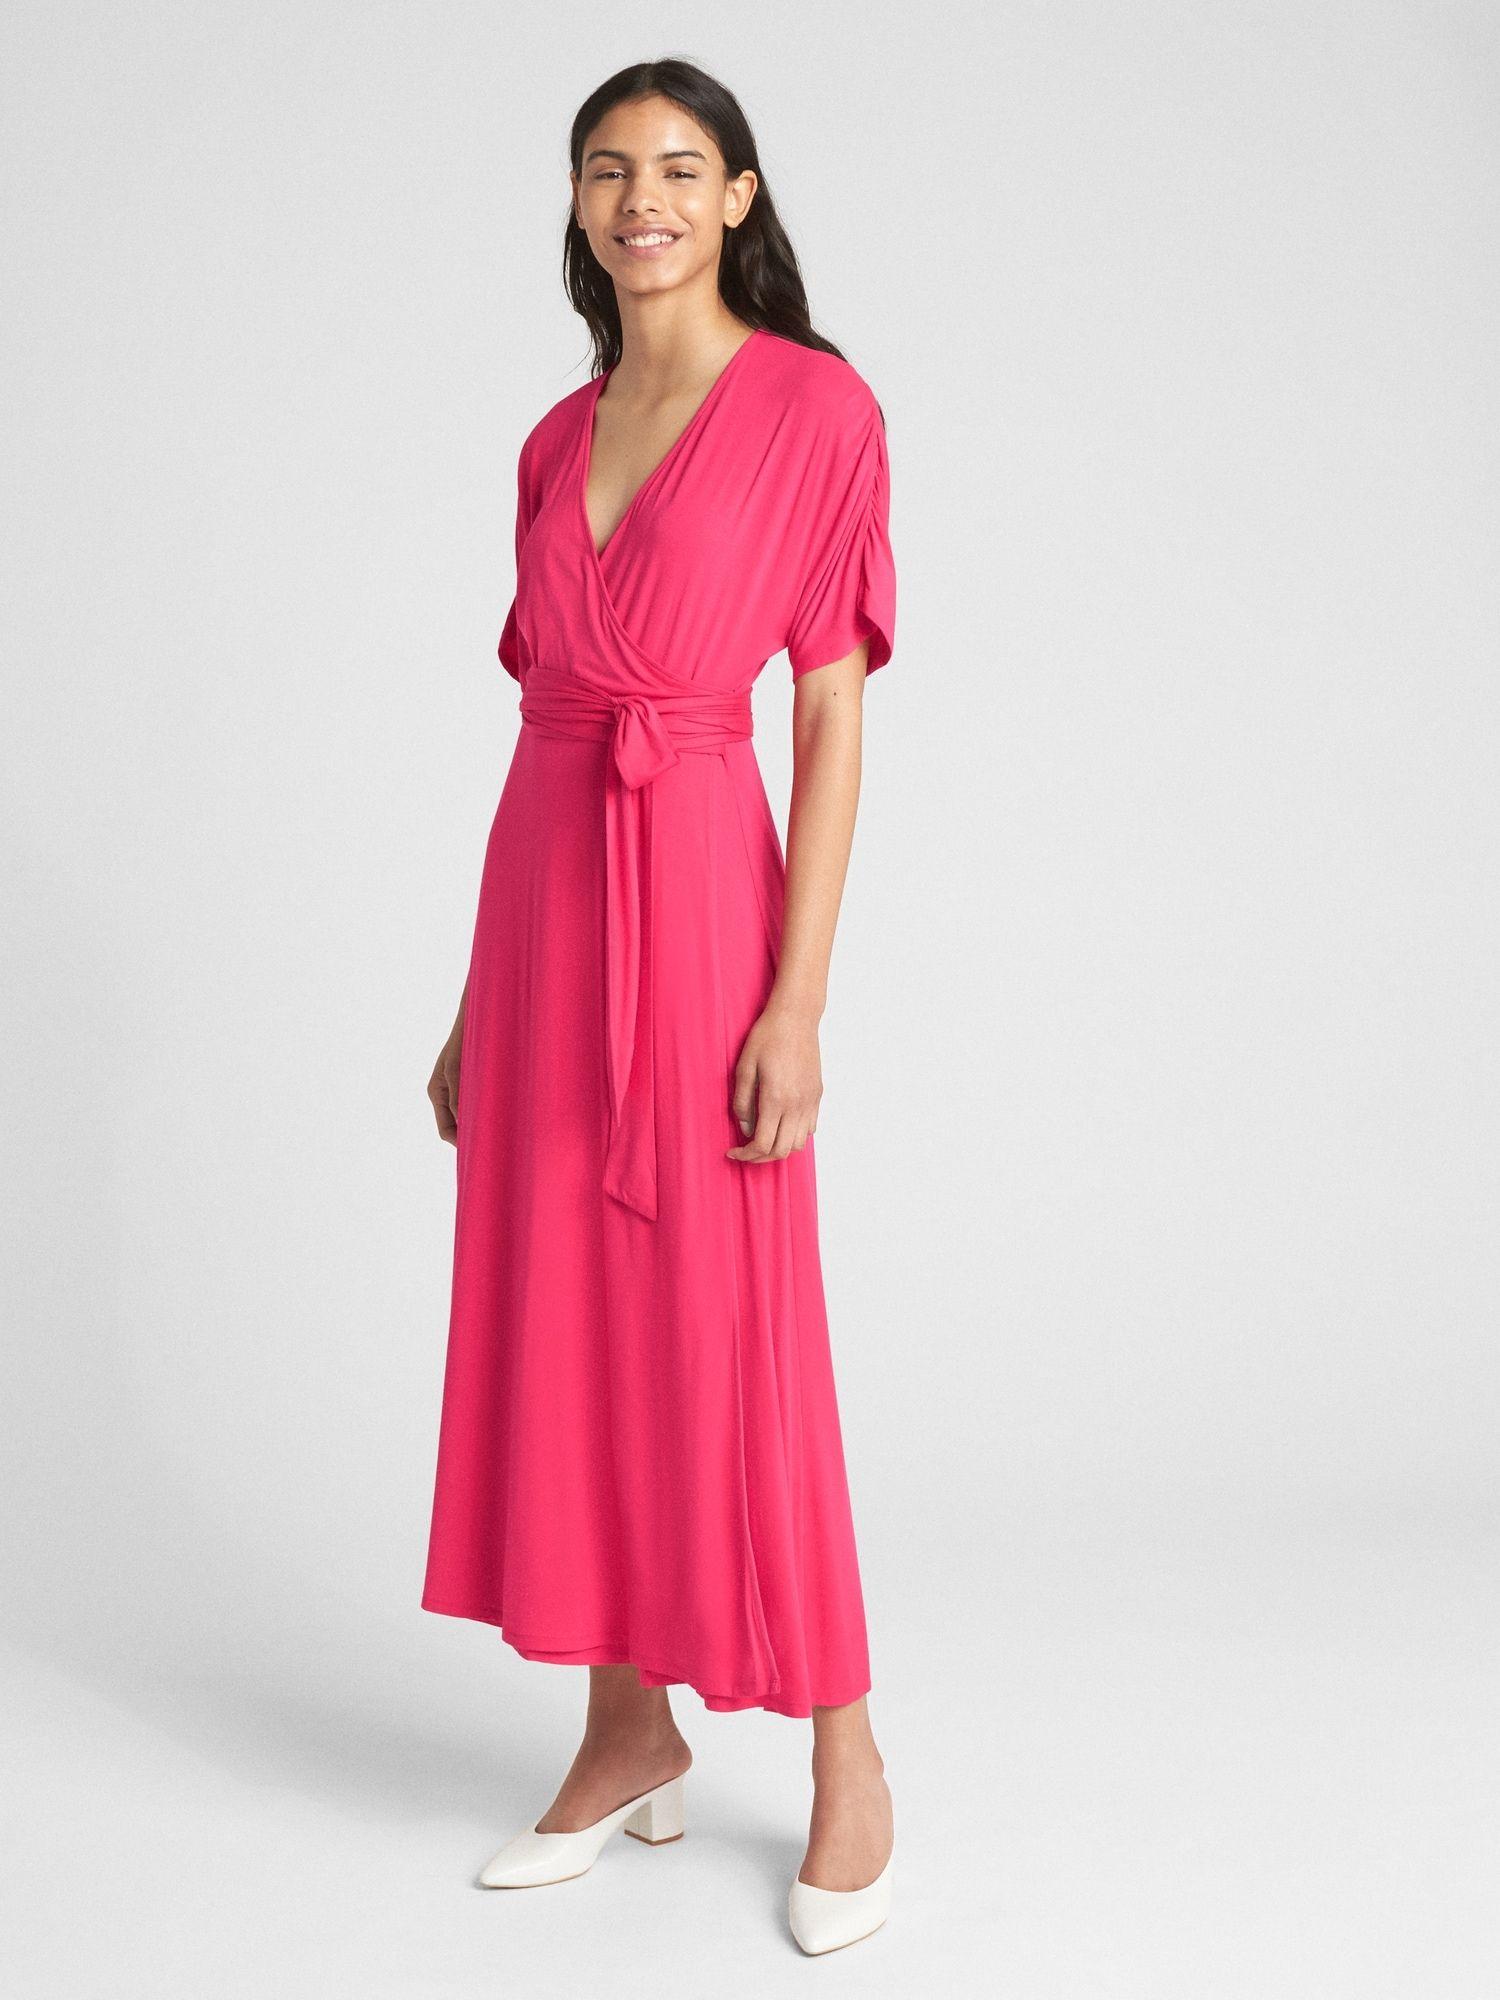 Short Sleeve Wrap Maxi Dress Gap Women Clothes Sale Maxi Wrap Dress Maxi Dress [ 2000 x 1500 Pixel ]